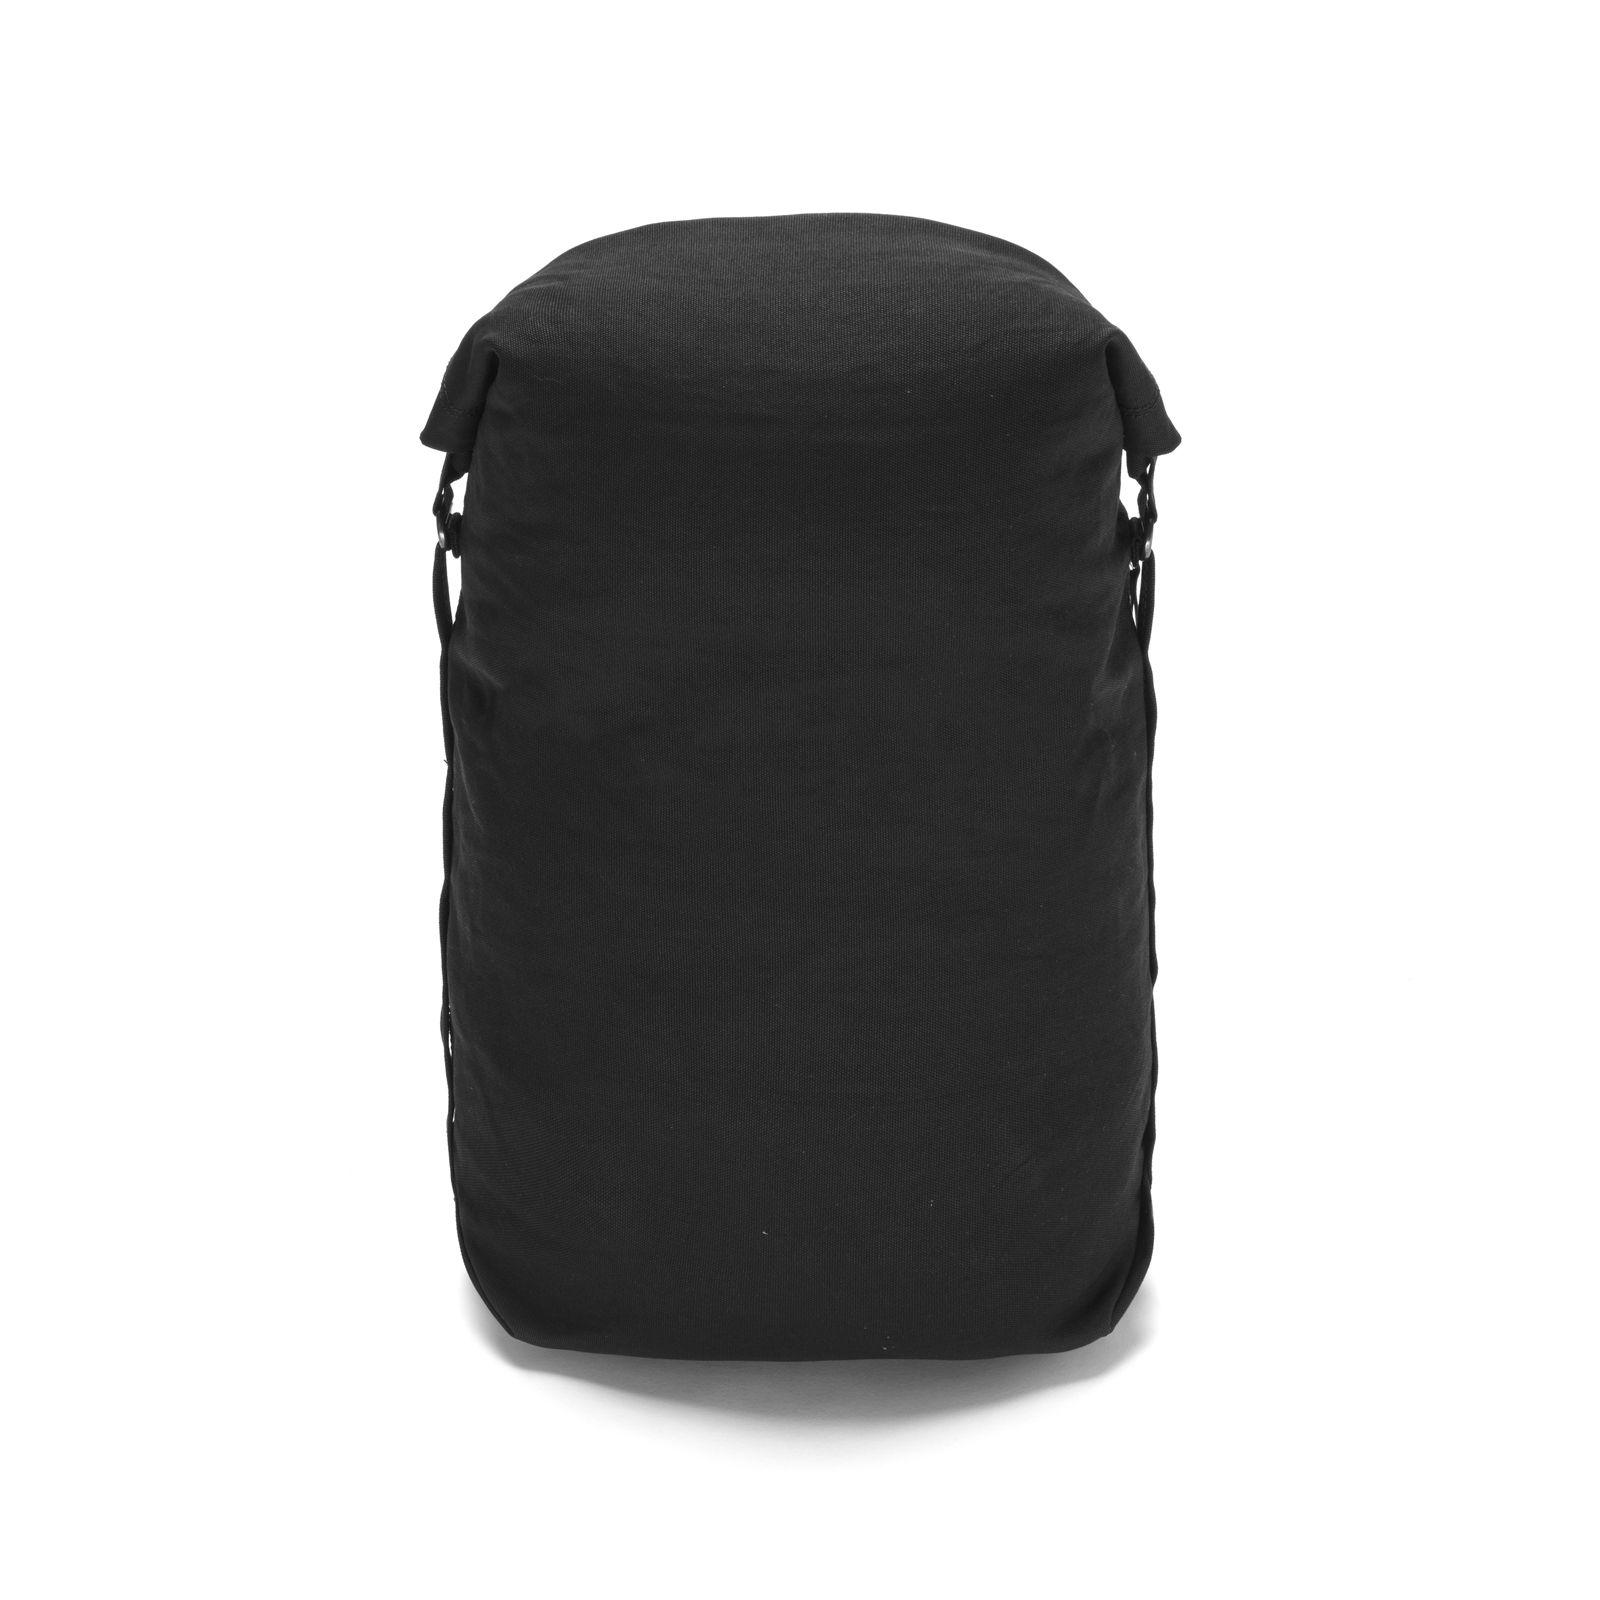 Roll Pack / Bananatex® - All Black